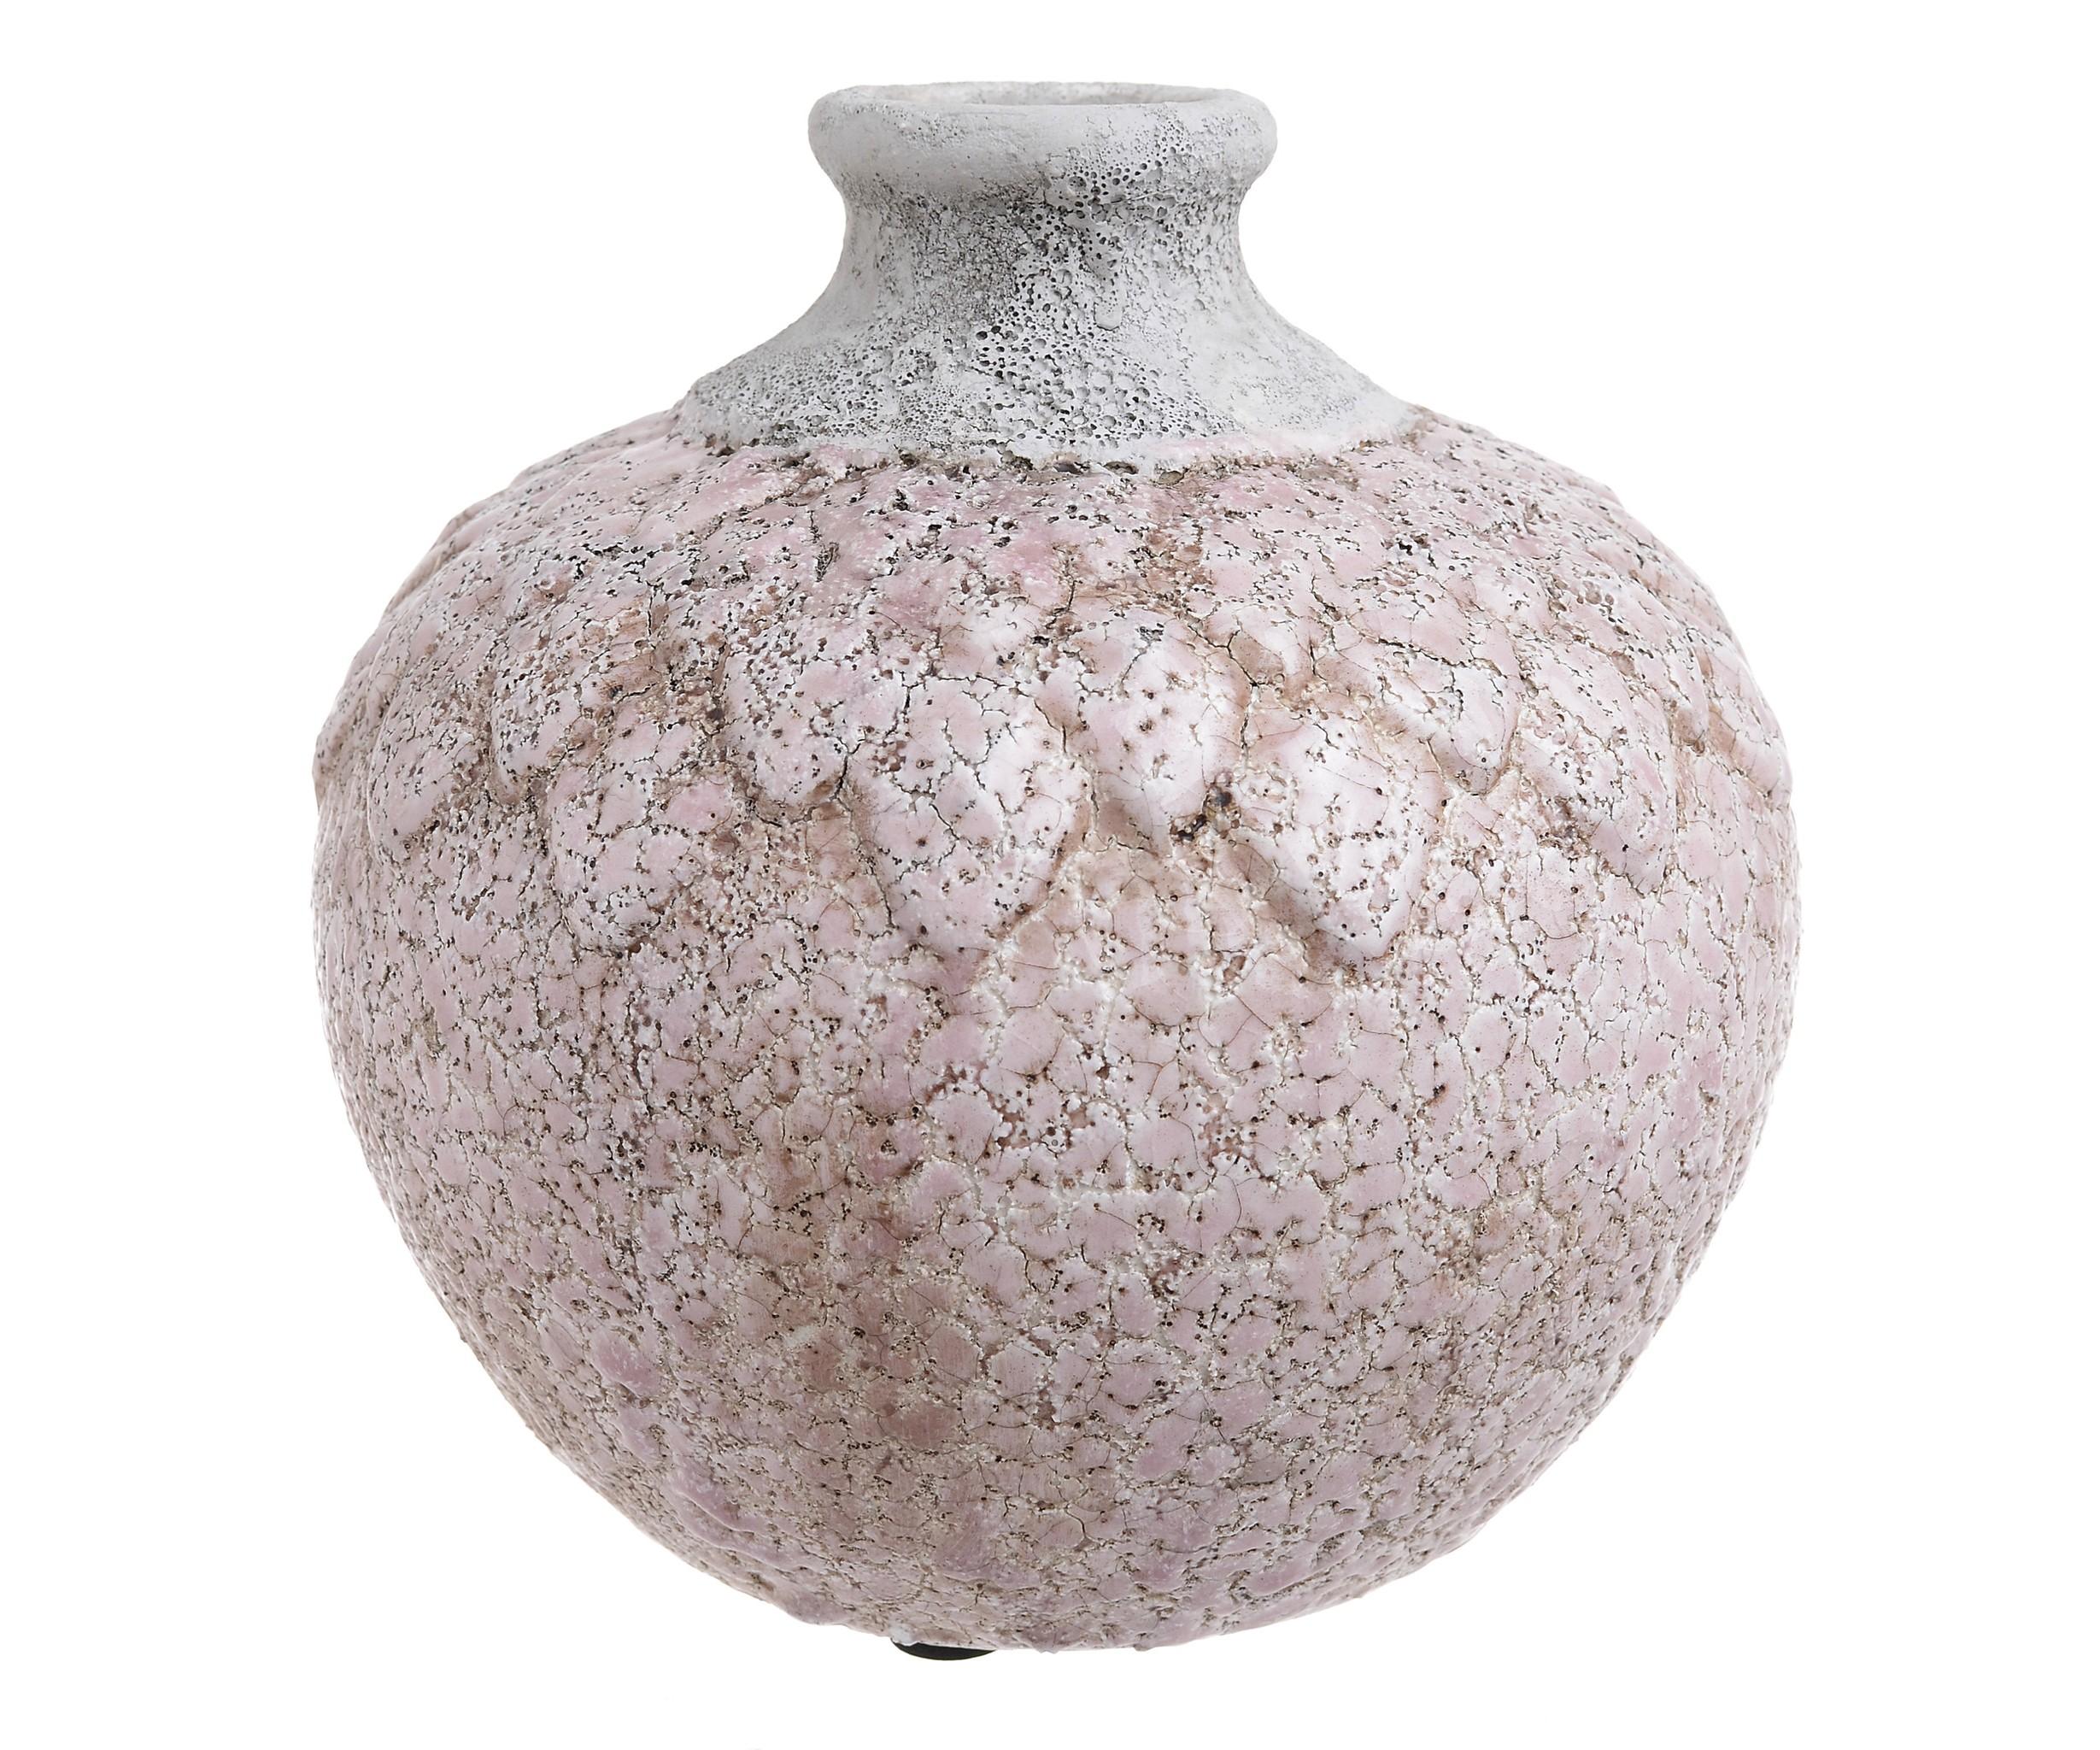 Ваза GaultierВазы<br><br><br>Material: Керамика<br>Ширина см: 18.0<br>Высота см: 17.5<br>Глубина см: 18.0